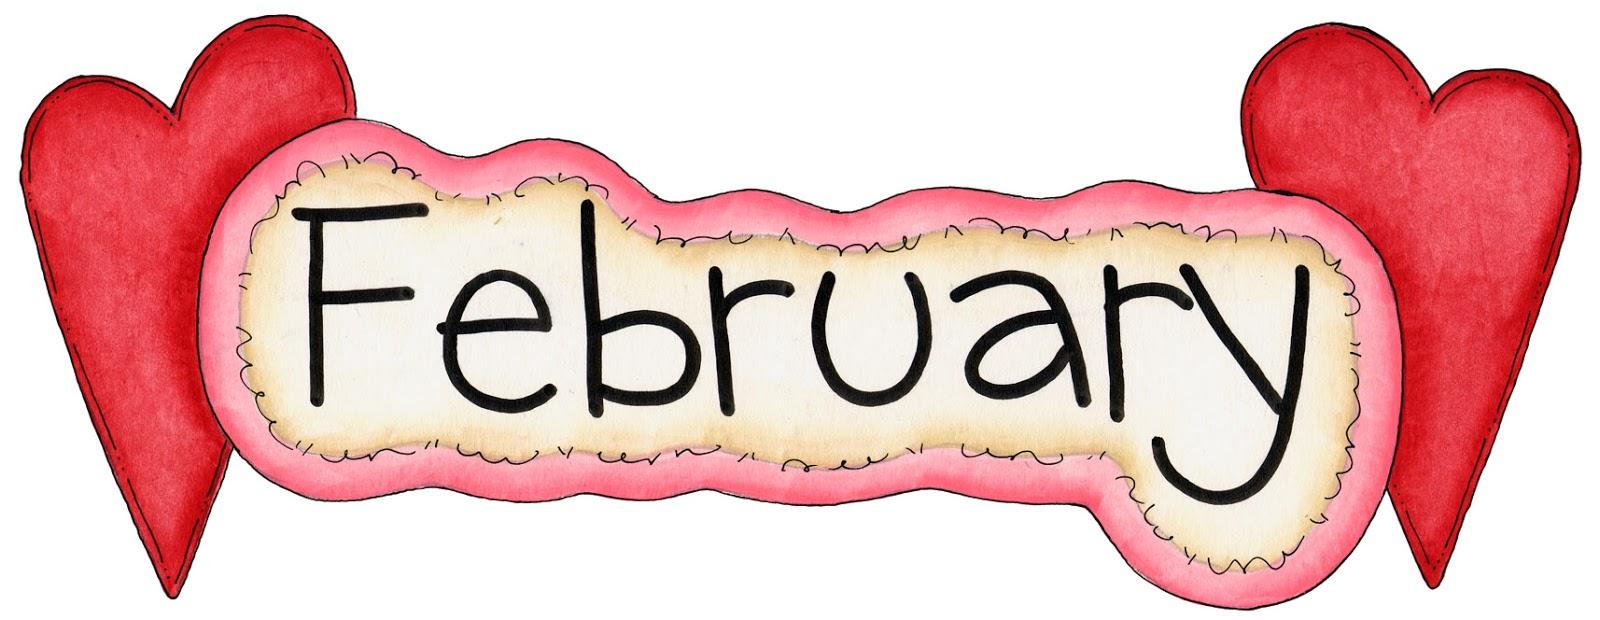 February Clip Art Images .-February clip art images .-8